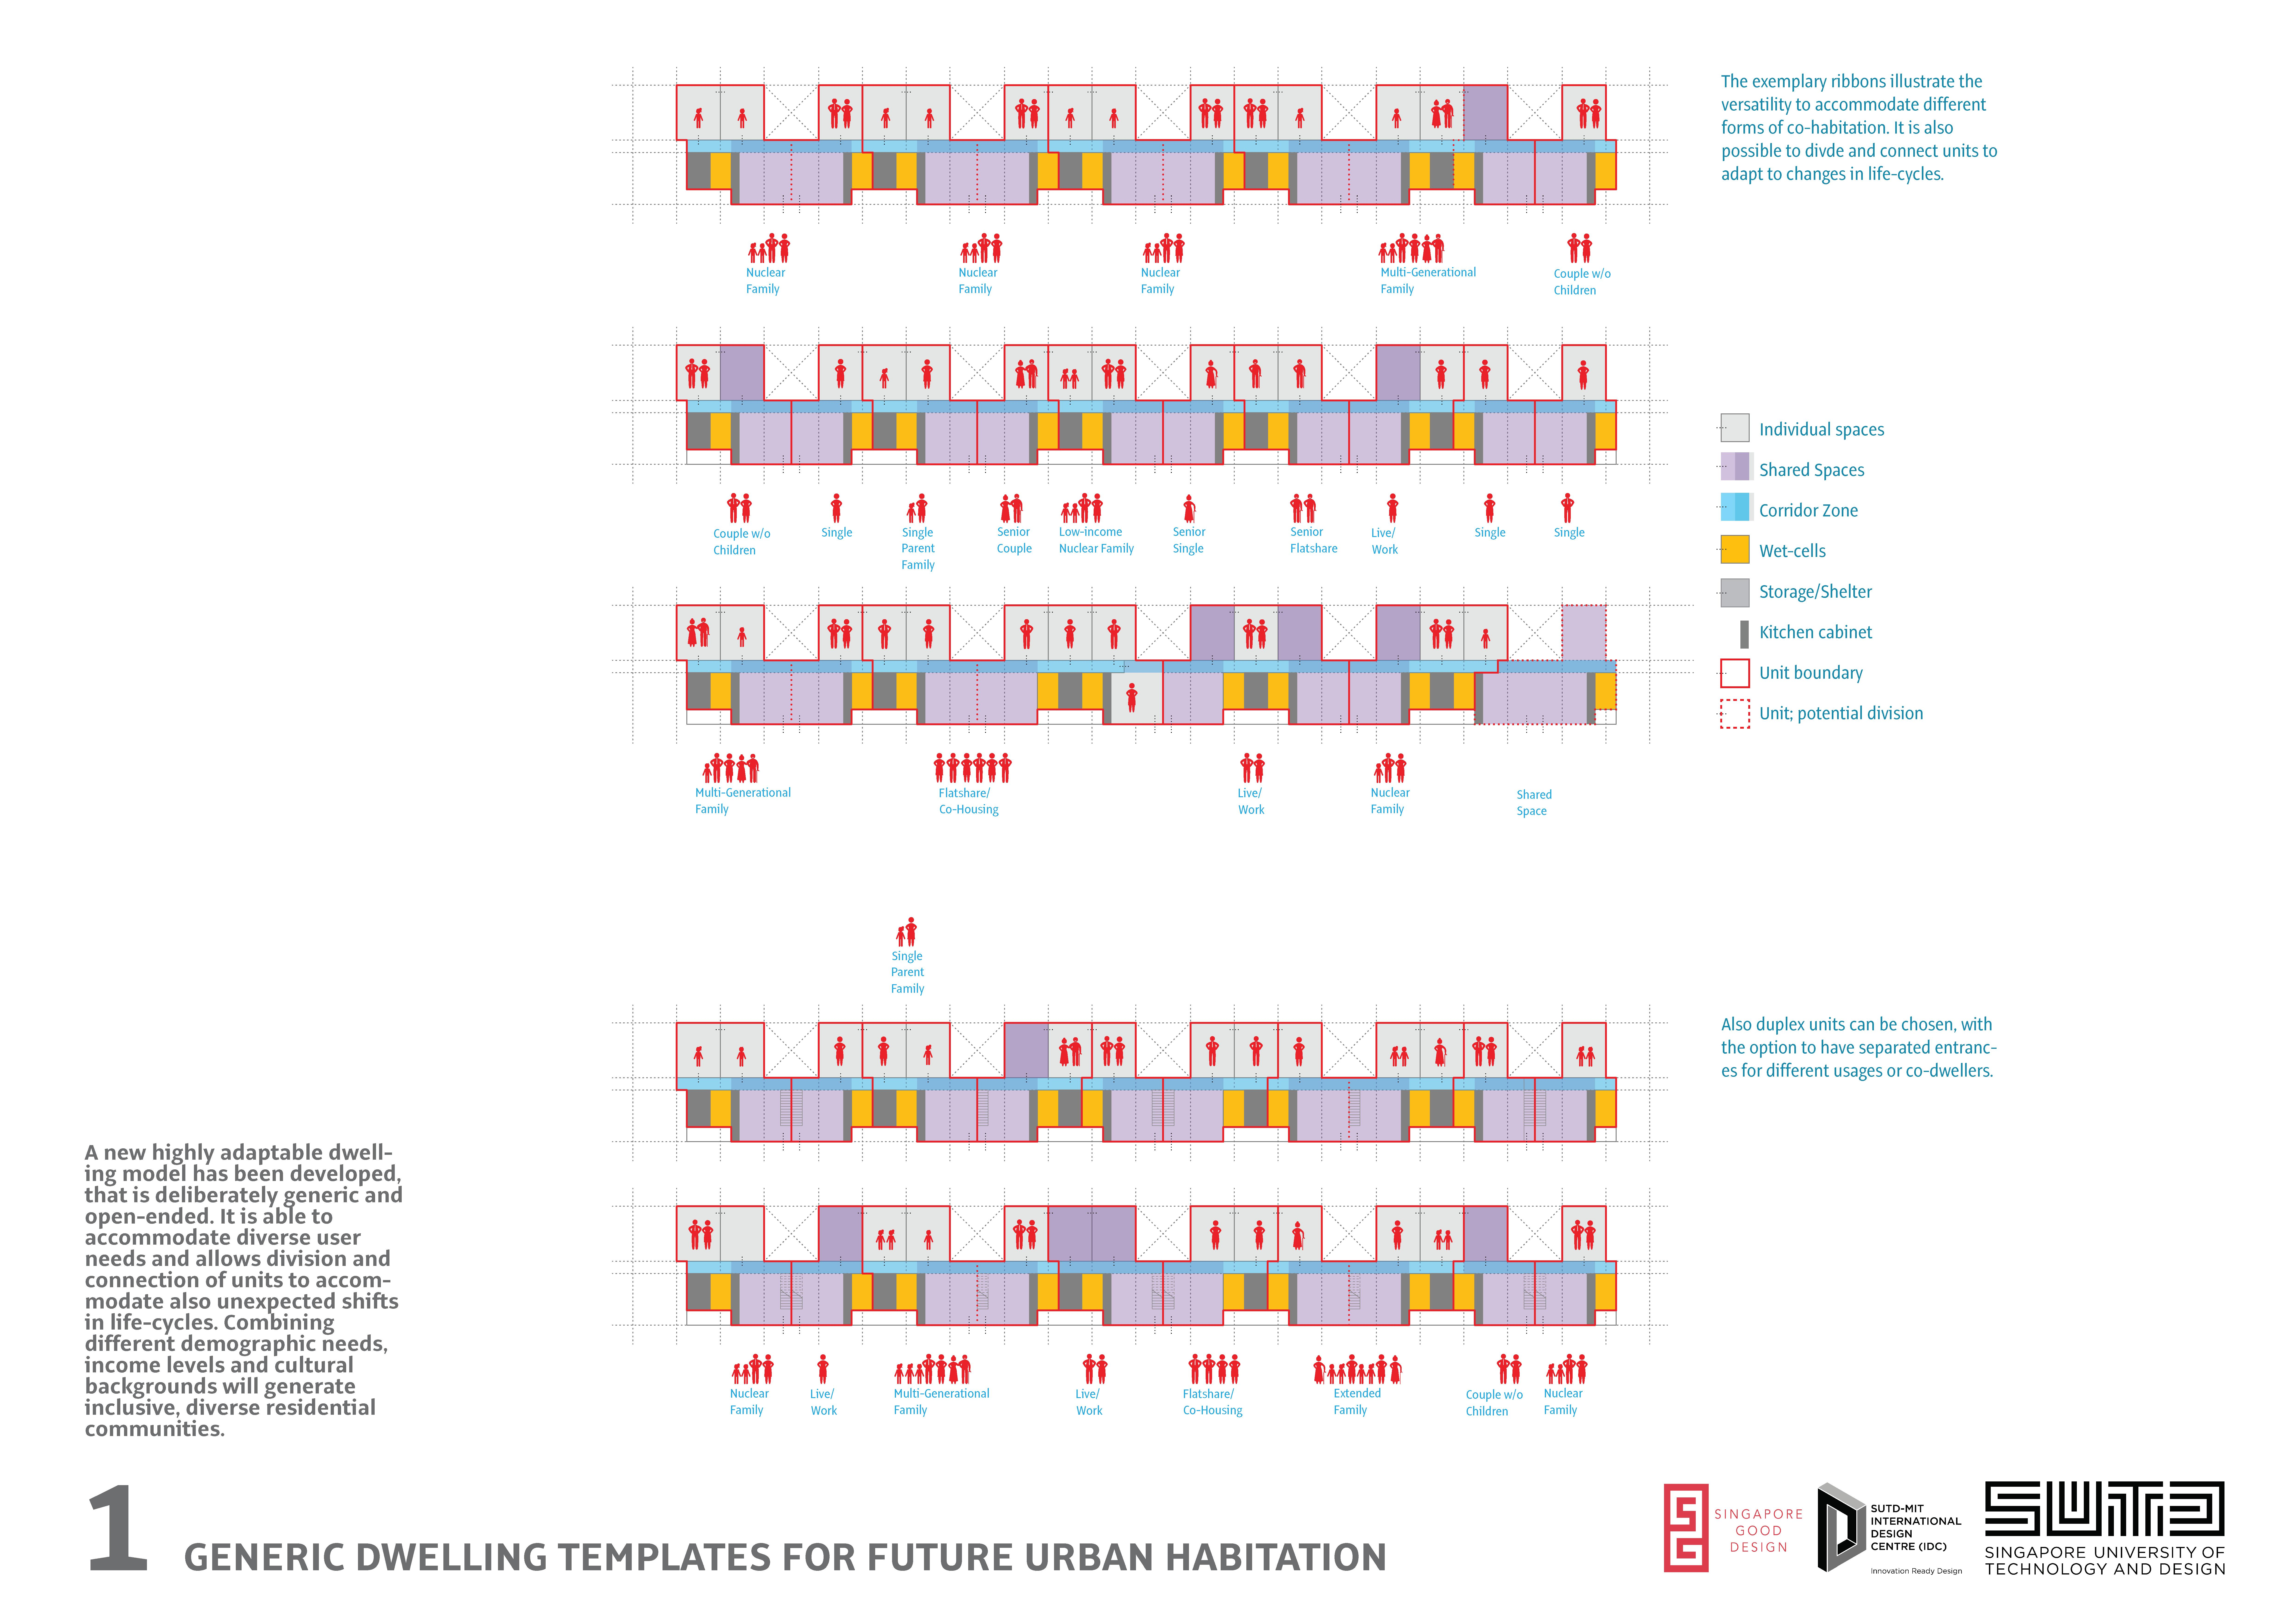 Generic Dwelling Templates for Future Urban Habitation